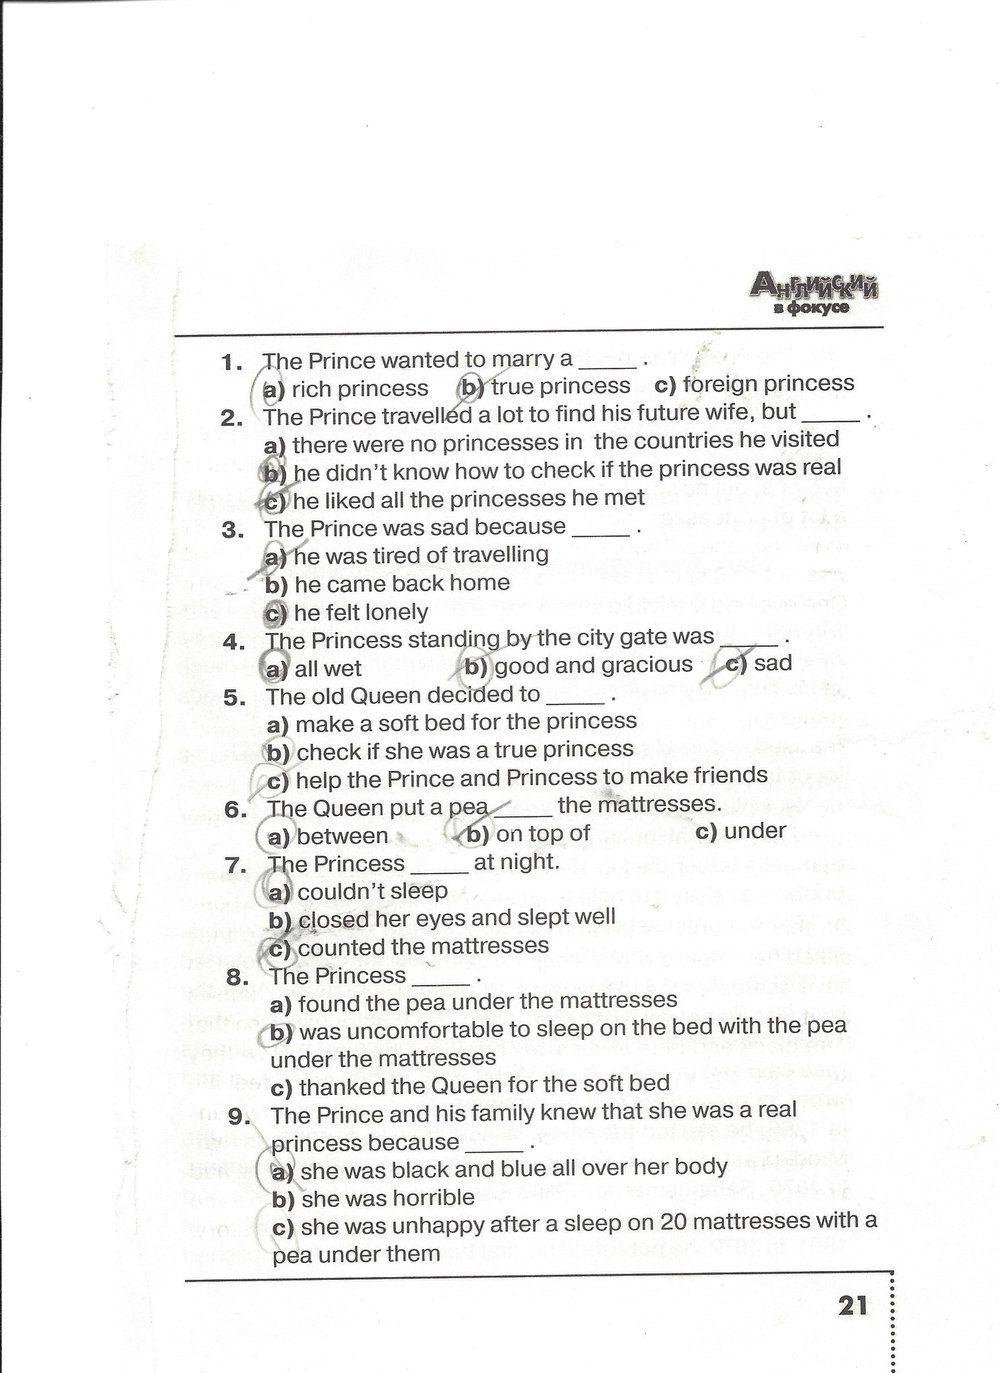 Решебник за 7 класс по англискаму рабочая тетрадь ваулин онлайн